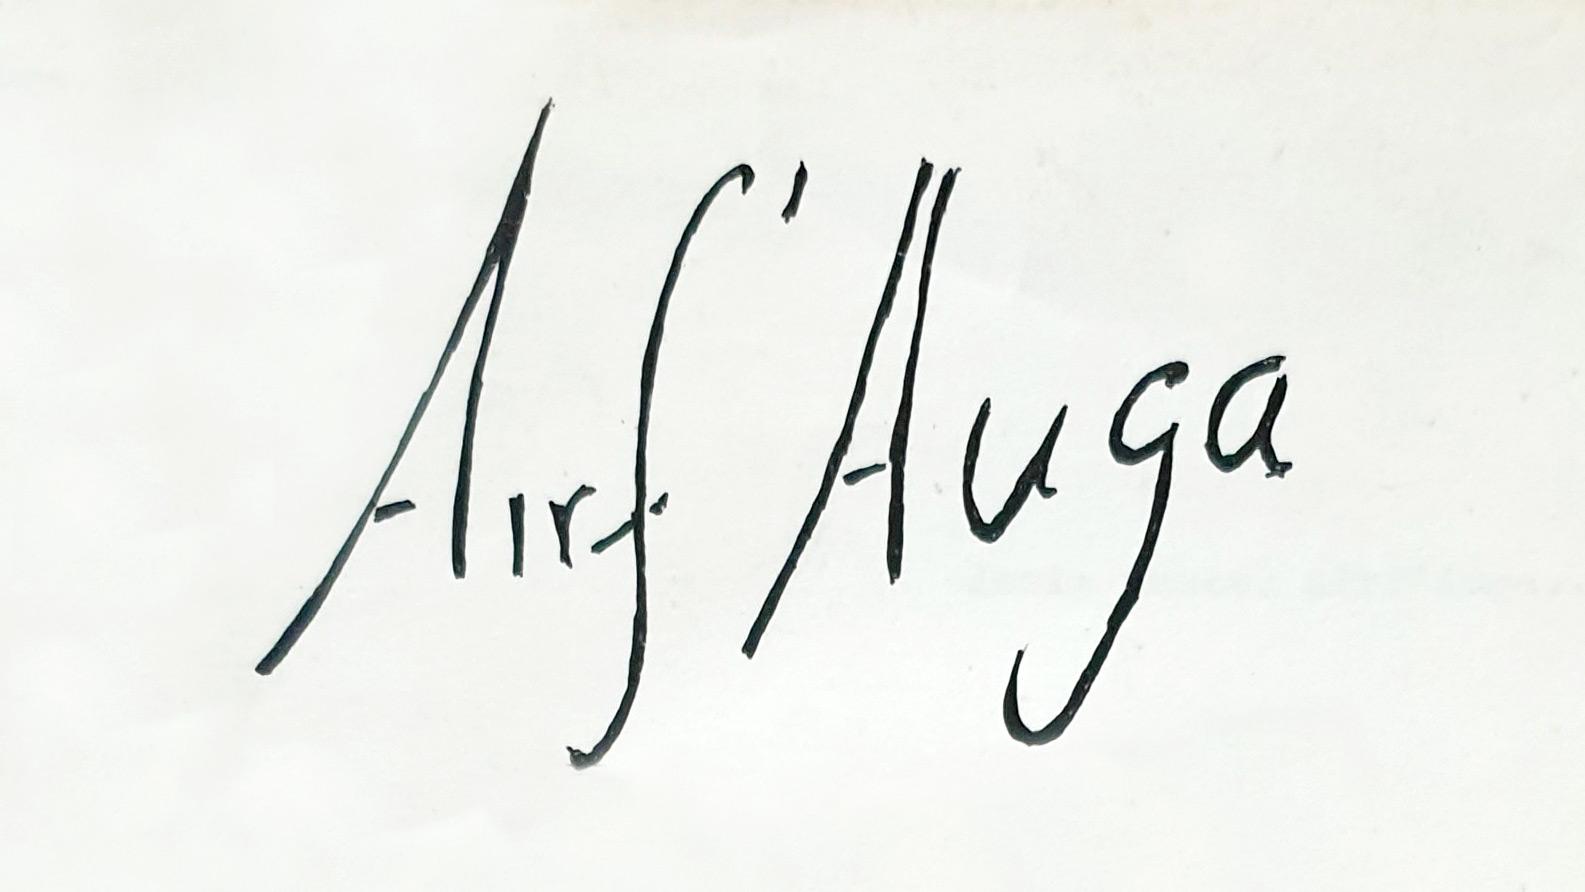 Airf'Auga